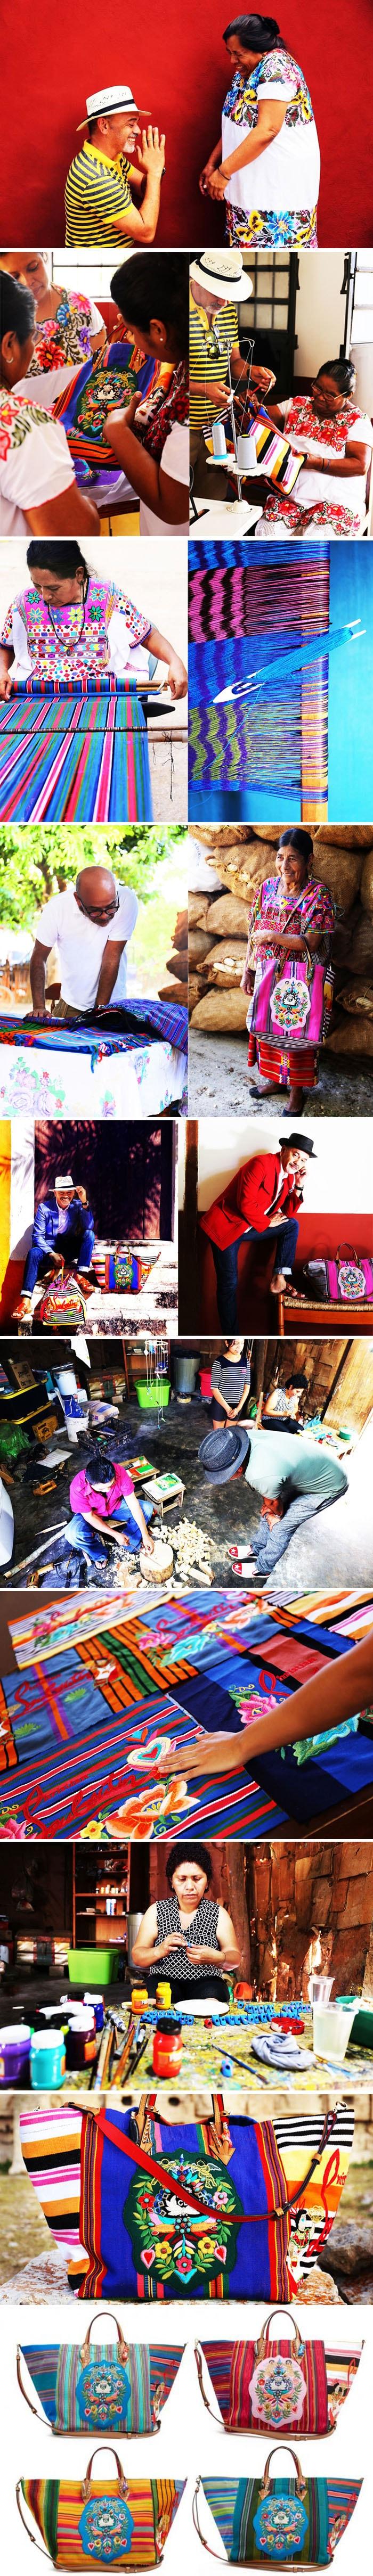 The Mexicaba : a fusão entre o vibrante artesanato maia e Cristian Louboutin stylo urbano